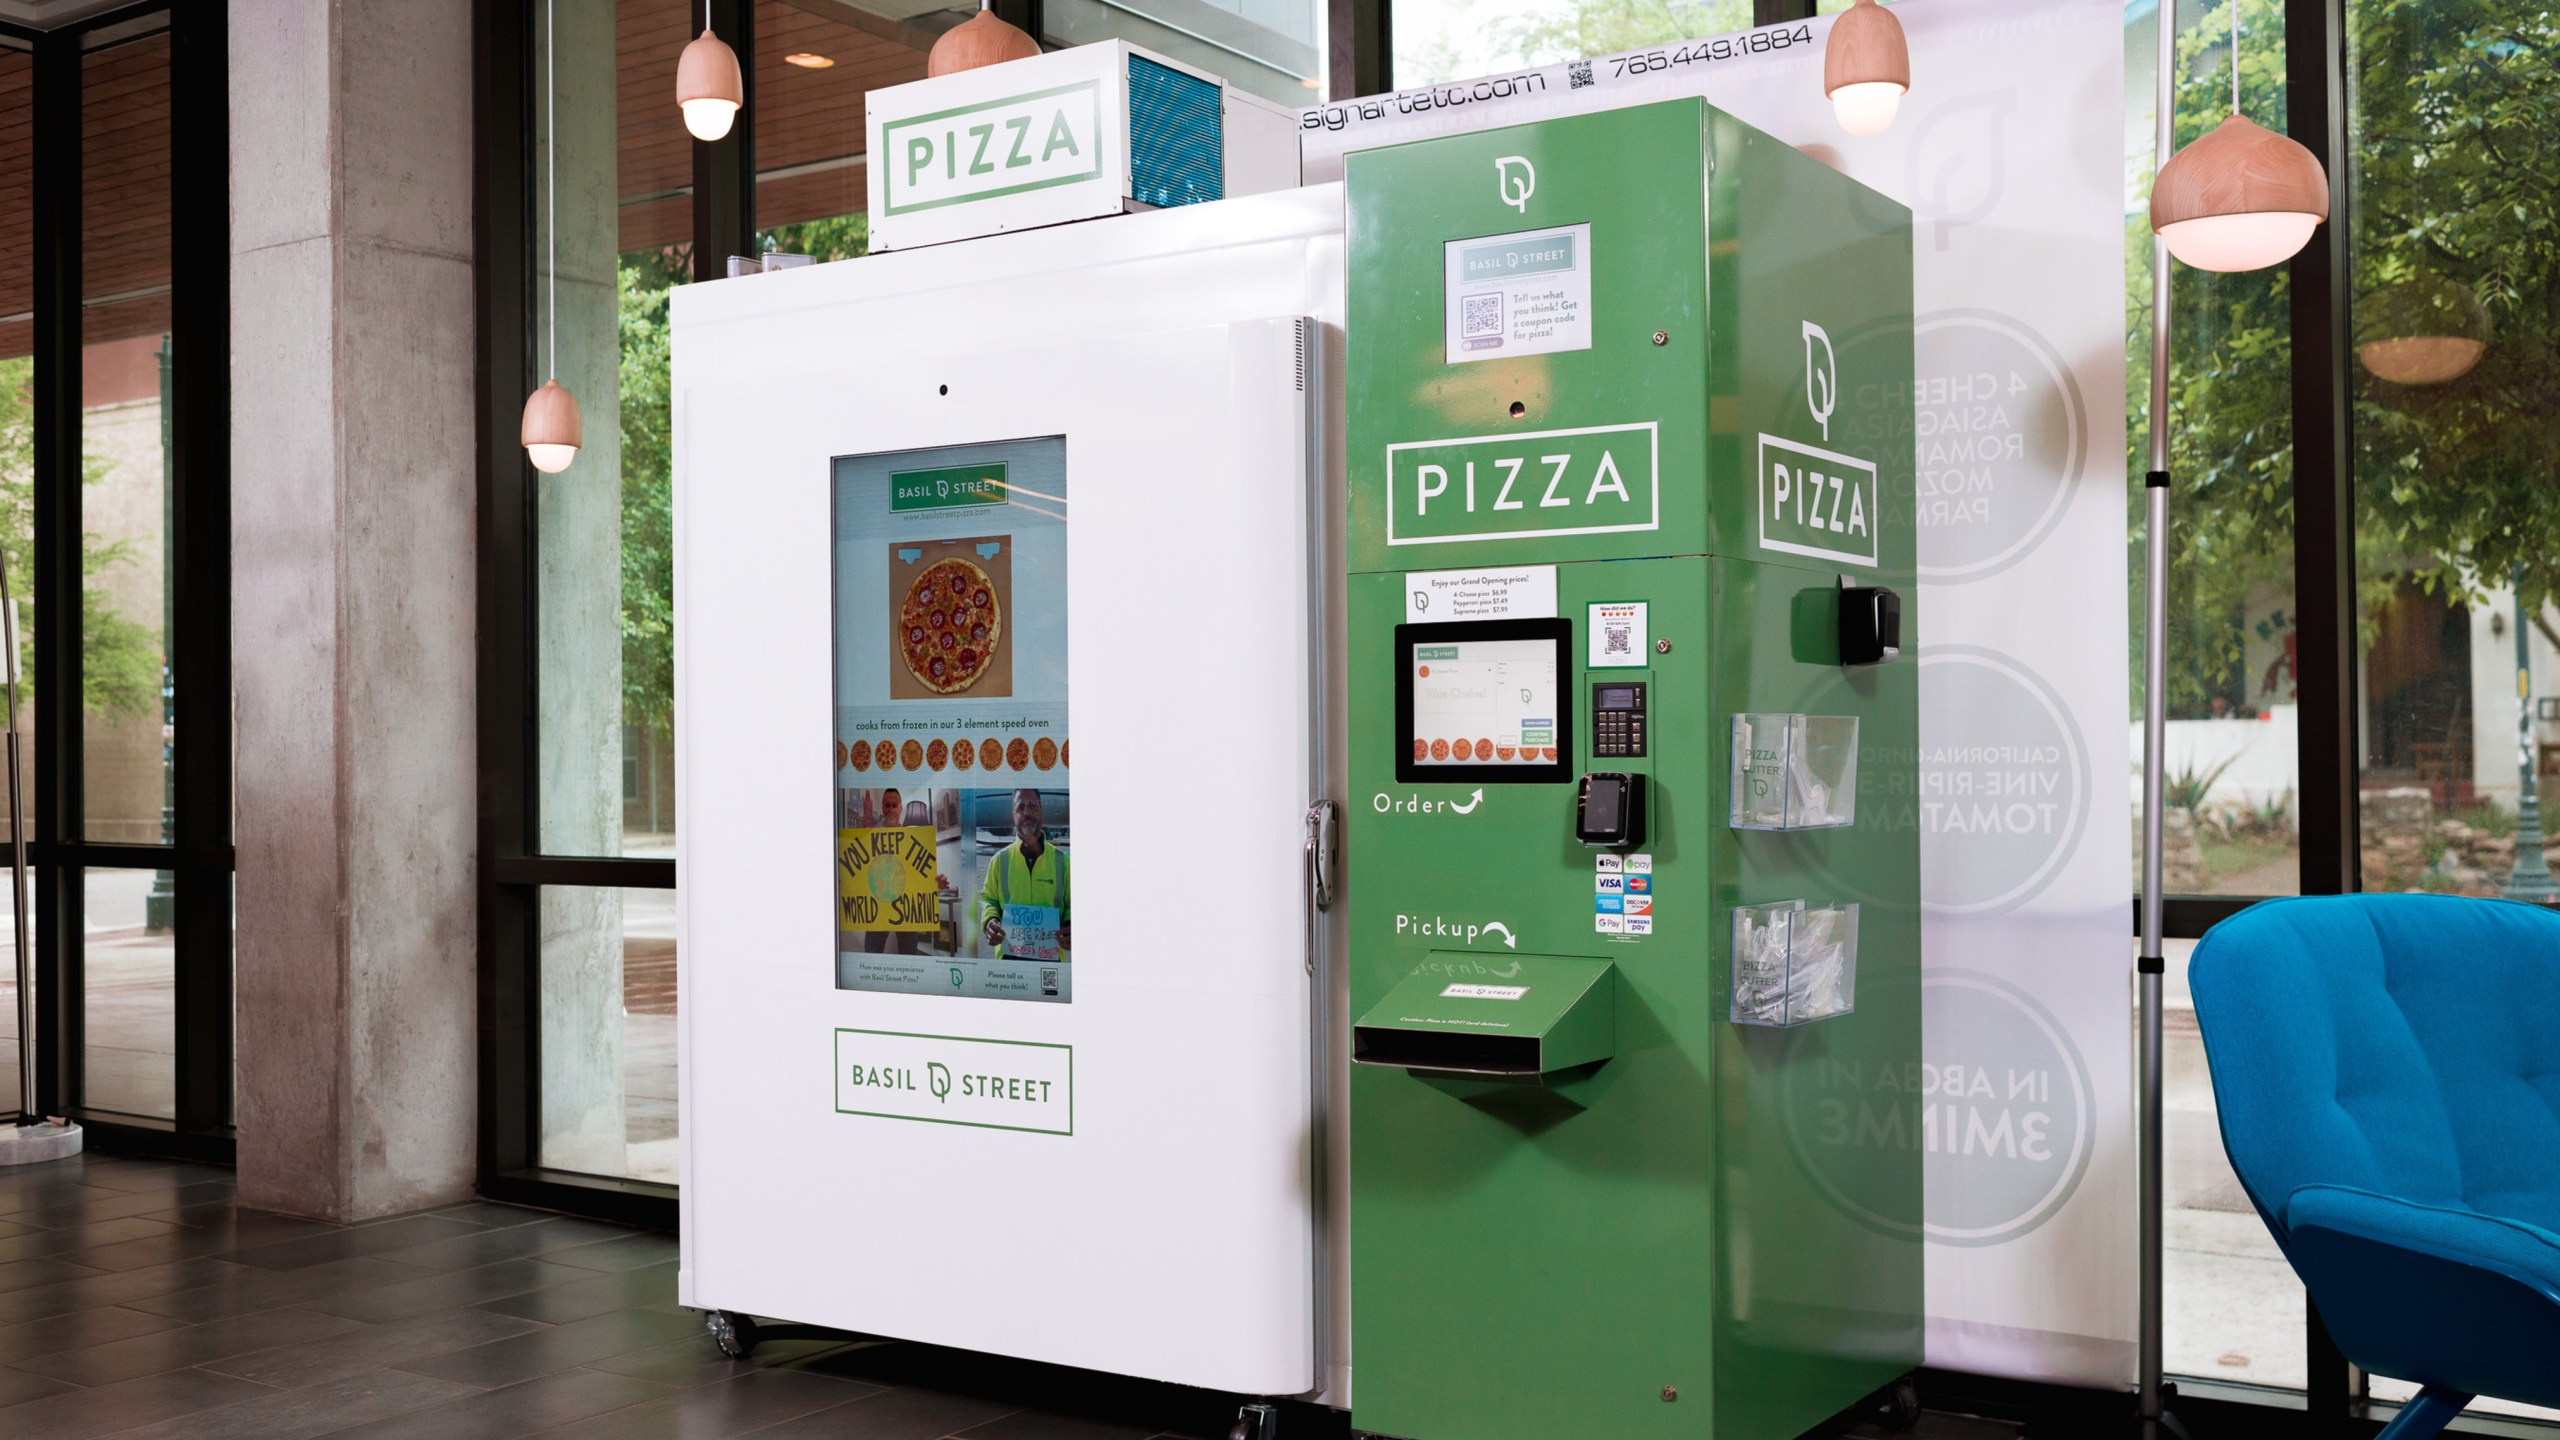 Basil Street Automated Pizza Kitchen (APK)